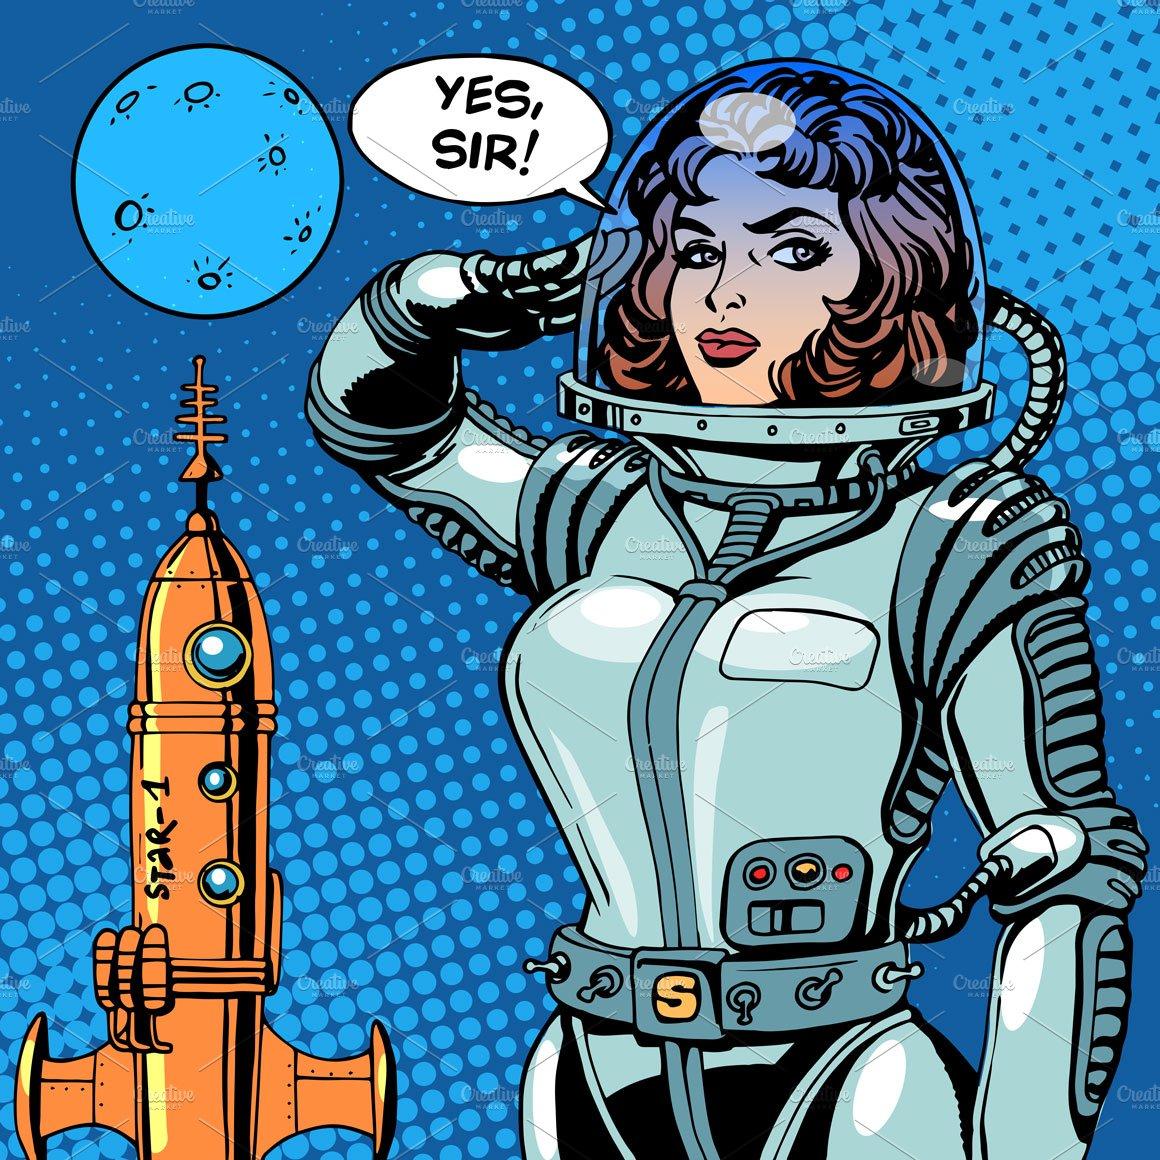 Japanese Sci Fi Art Iso50 Blog: Woman Astronaut Captain